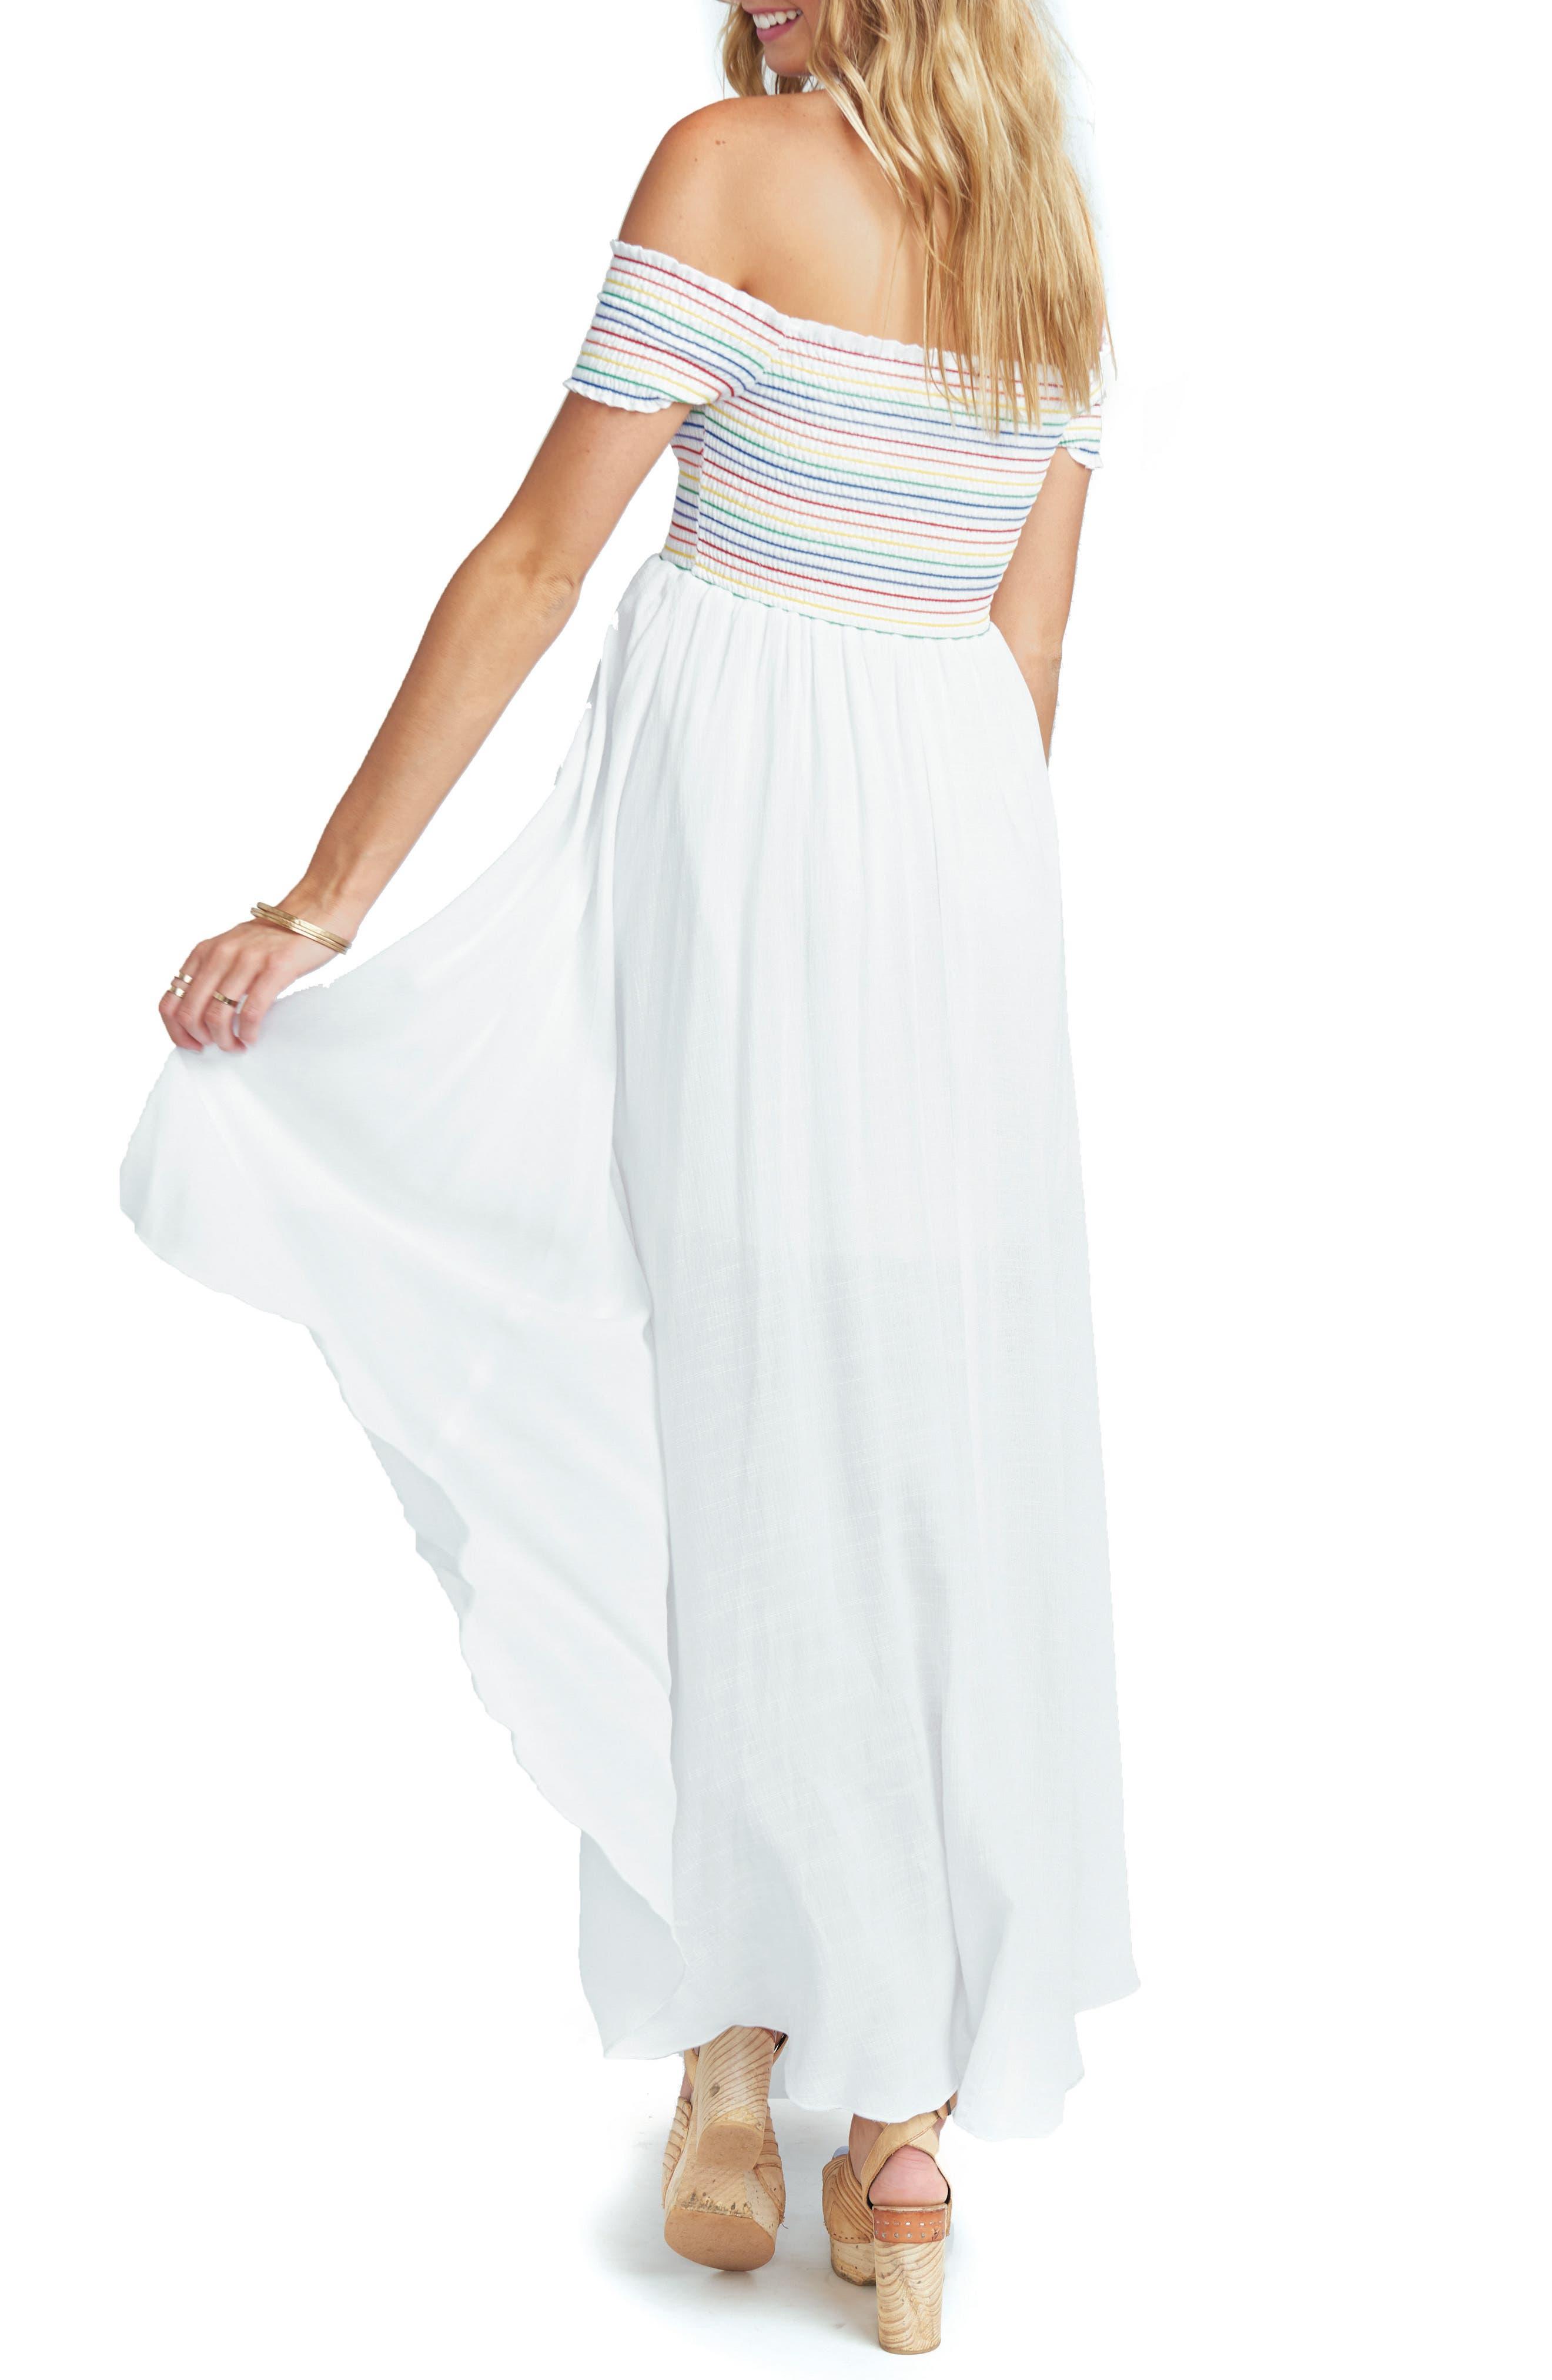 Willa Maxi Dress,                             Alternate thumbnail 2, color,                             White Cruise With Rainbow